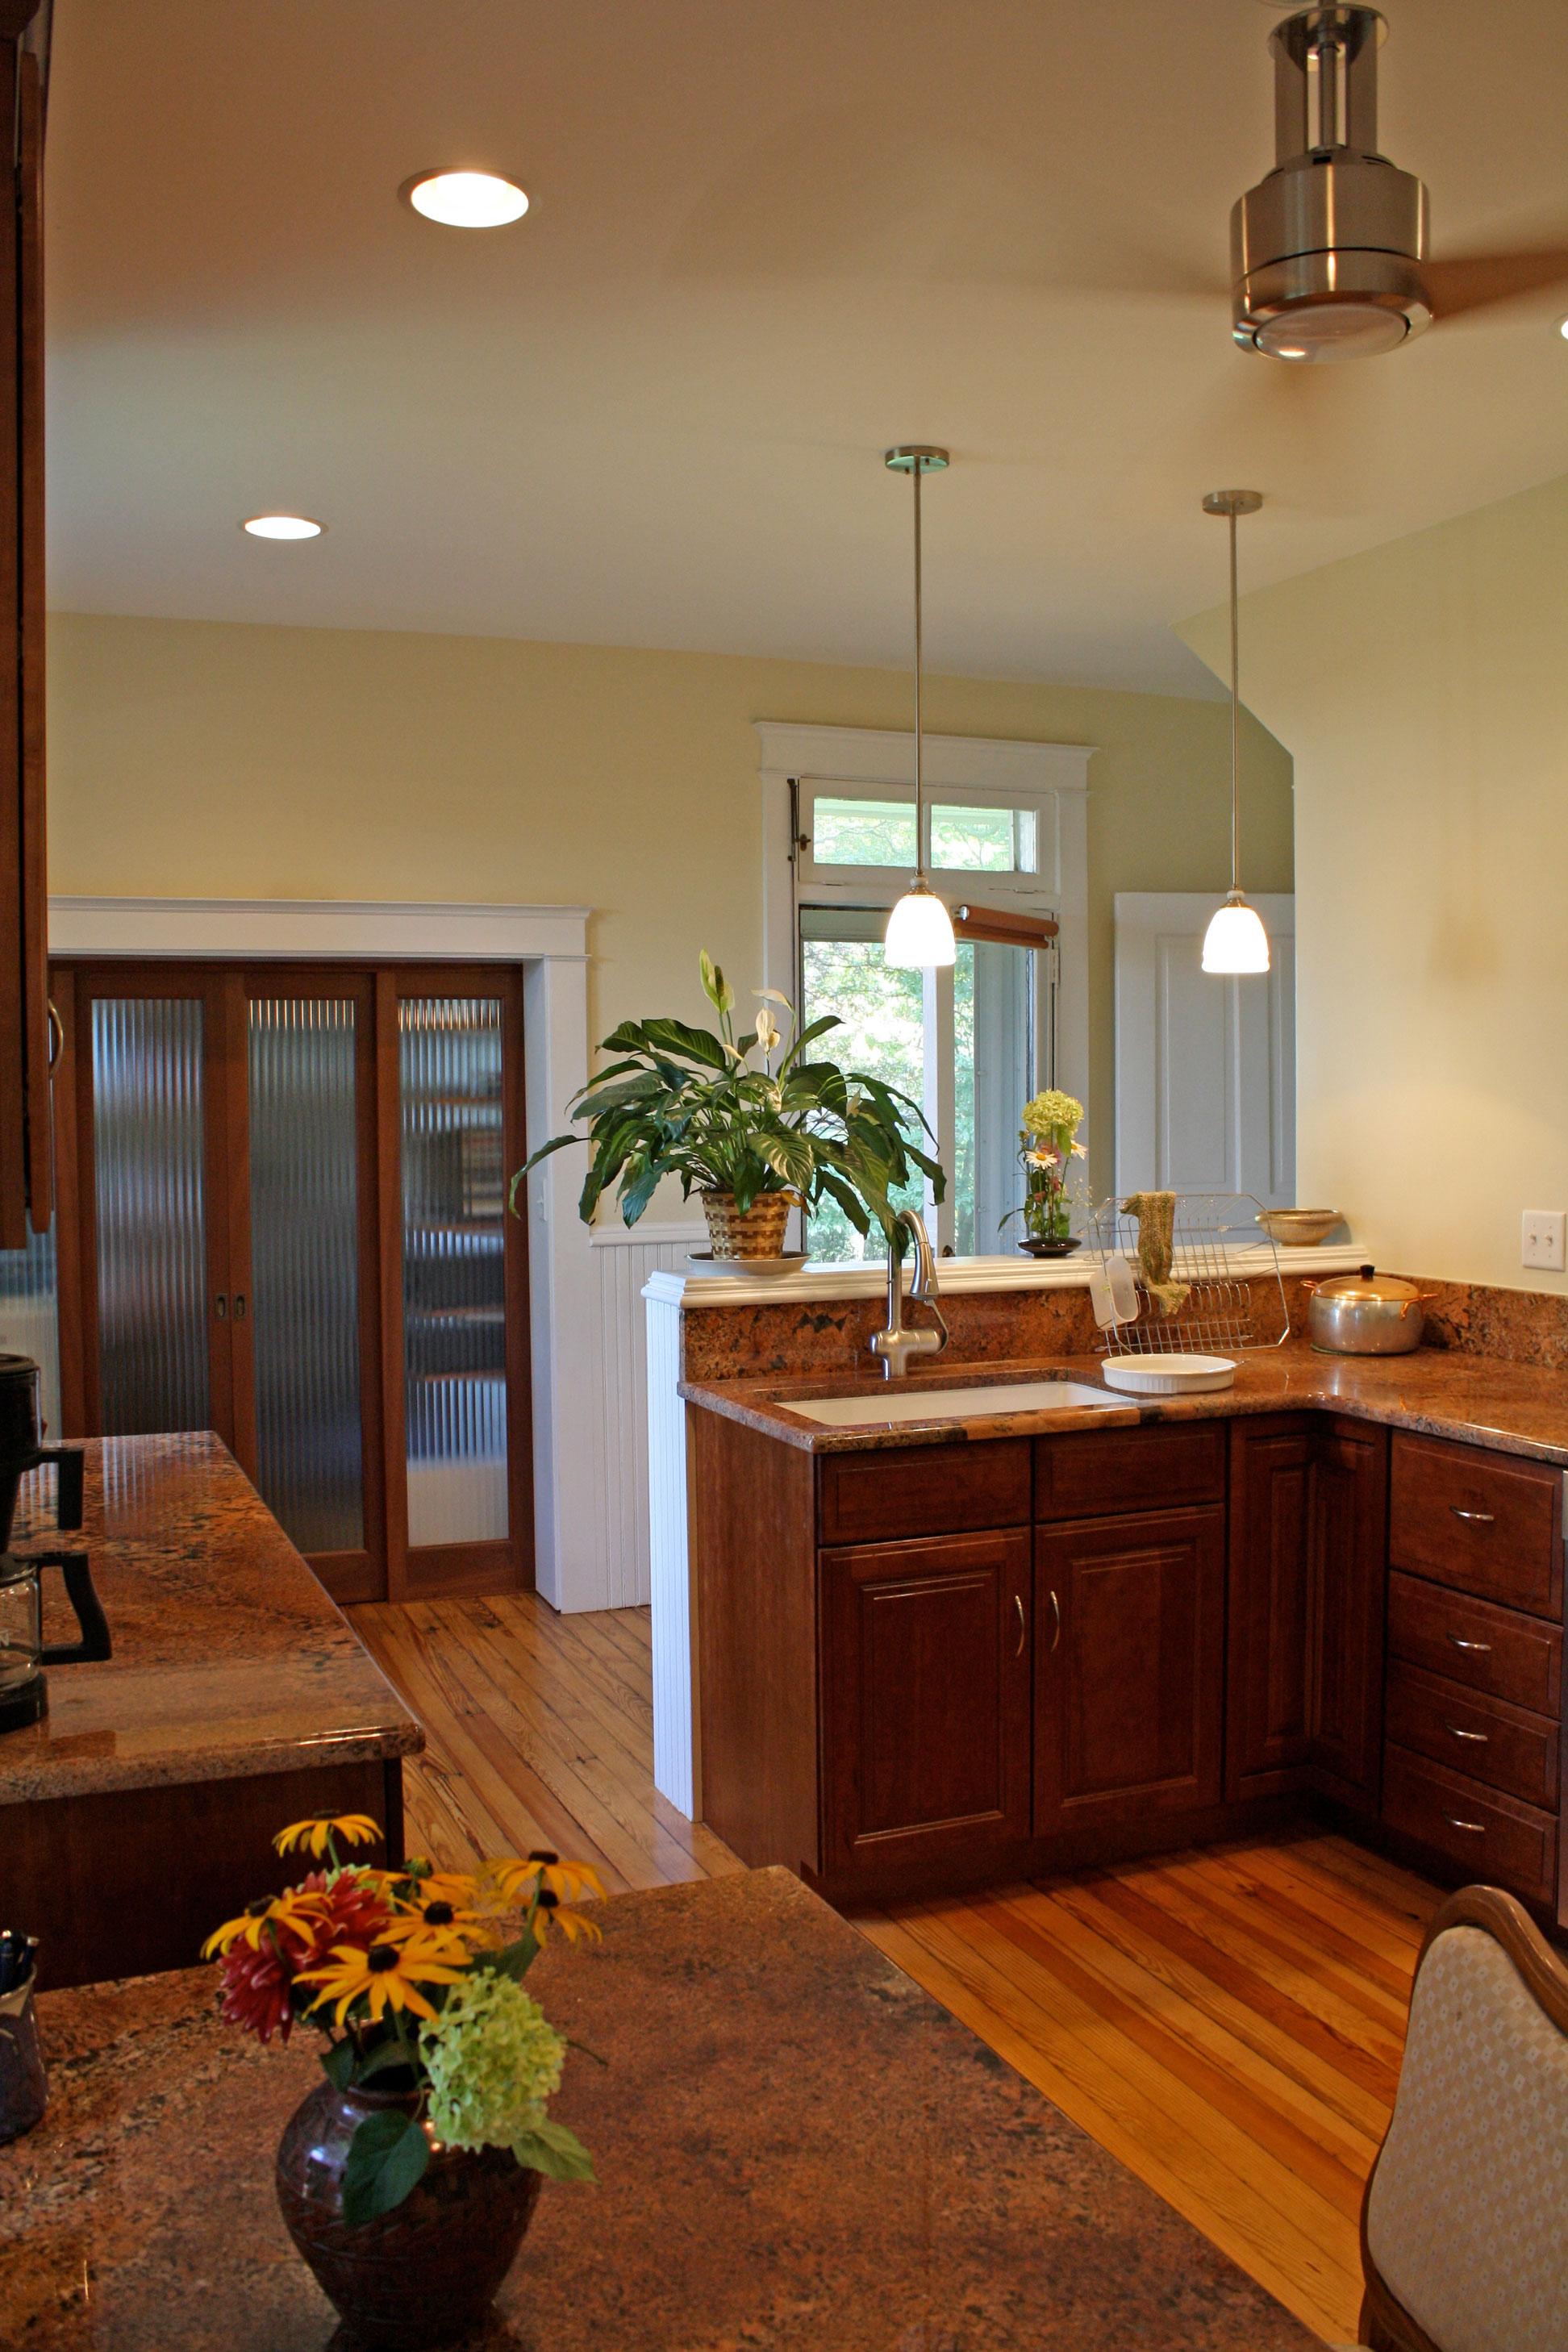 kitchen-interior-privacy-glass.jpg